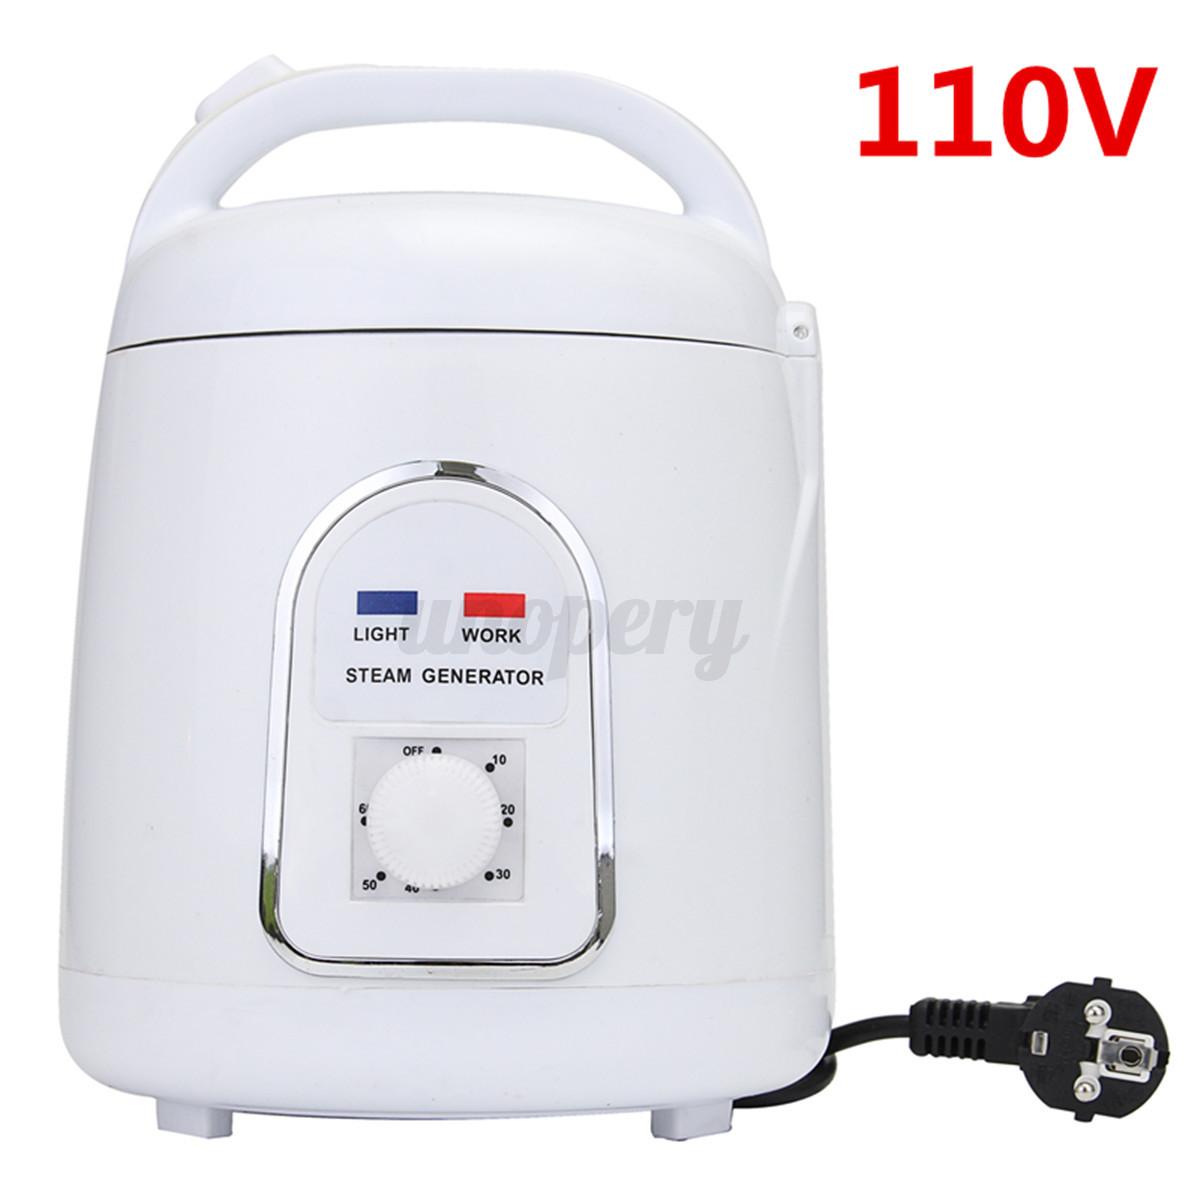 110V/220V 1.5L Steam Generator Steamer Pot Spa For